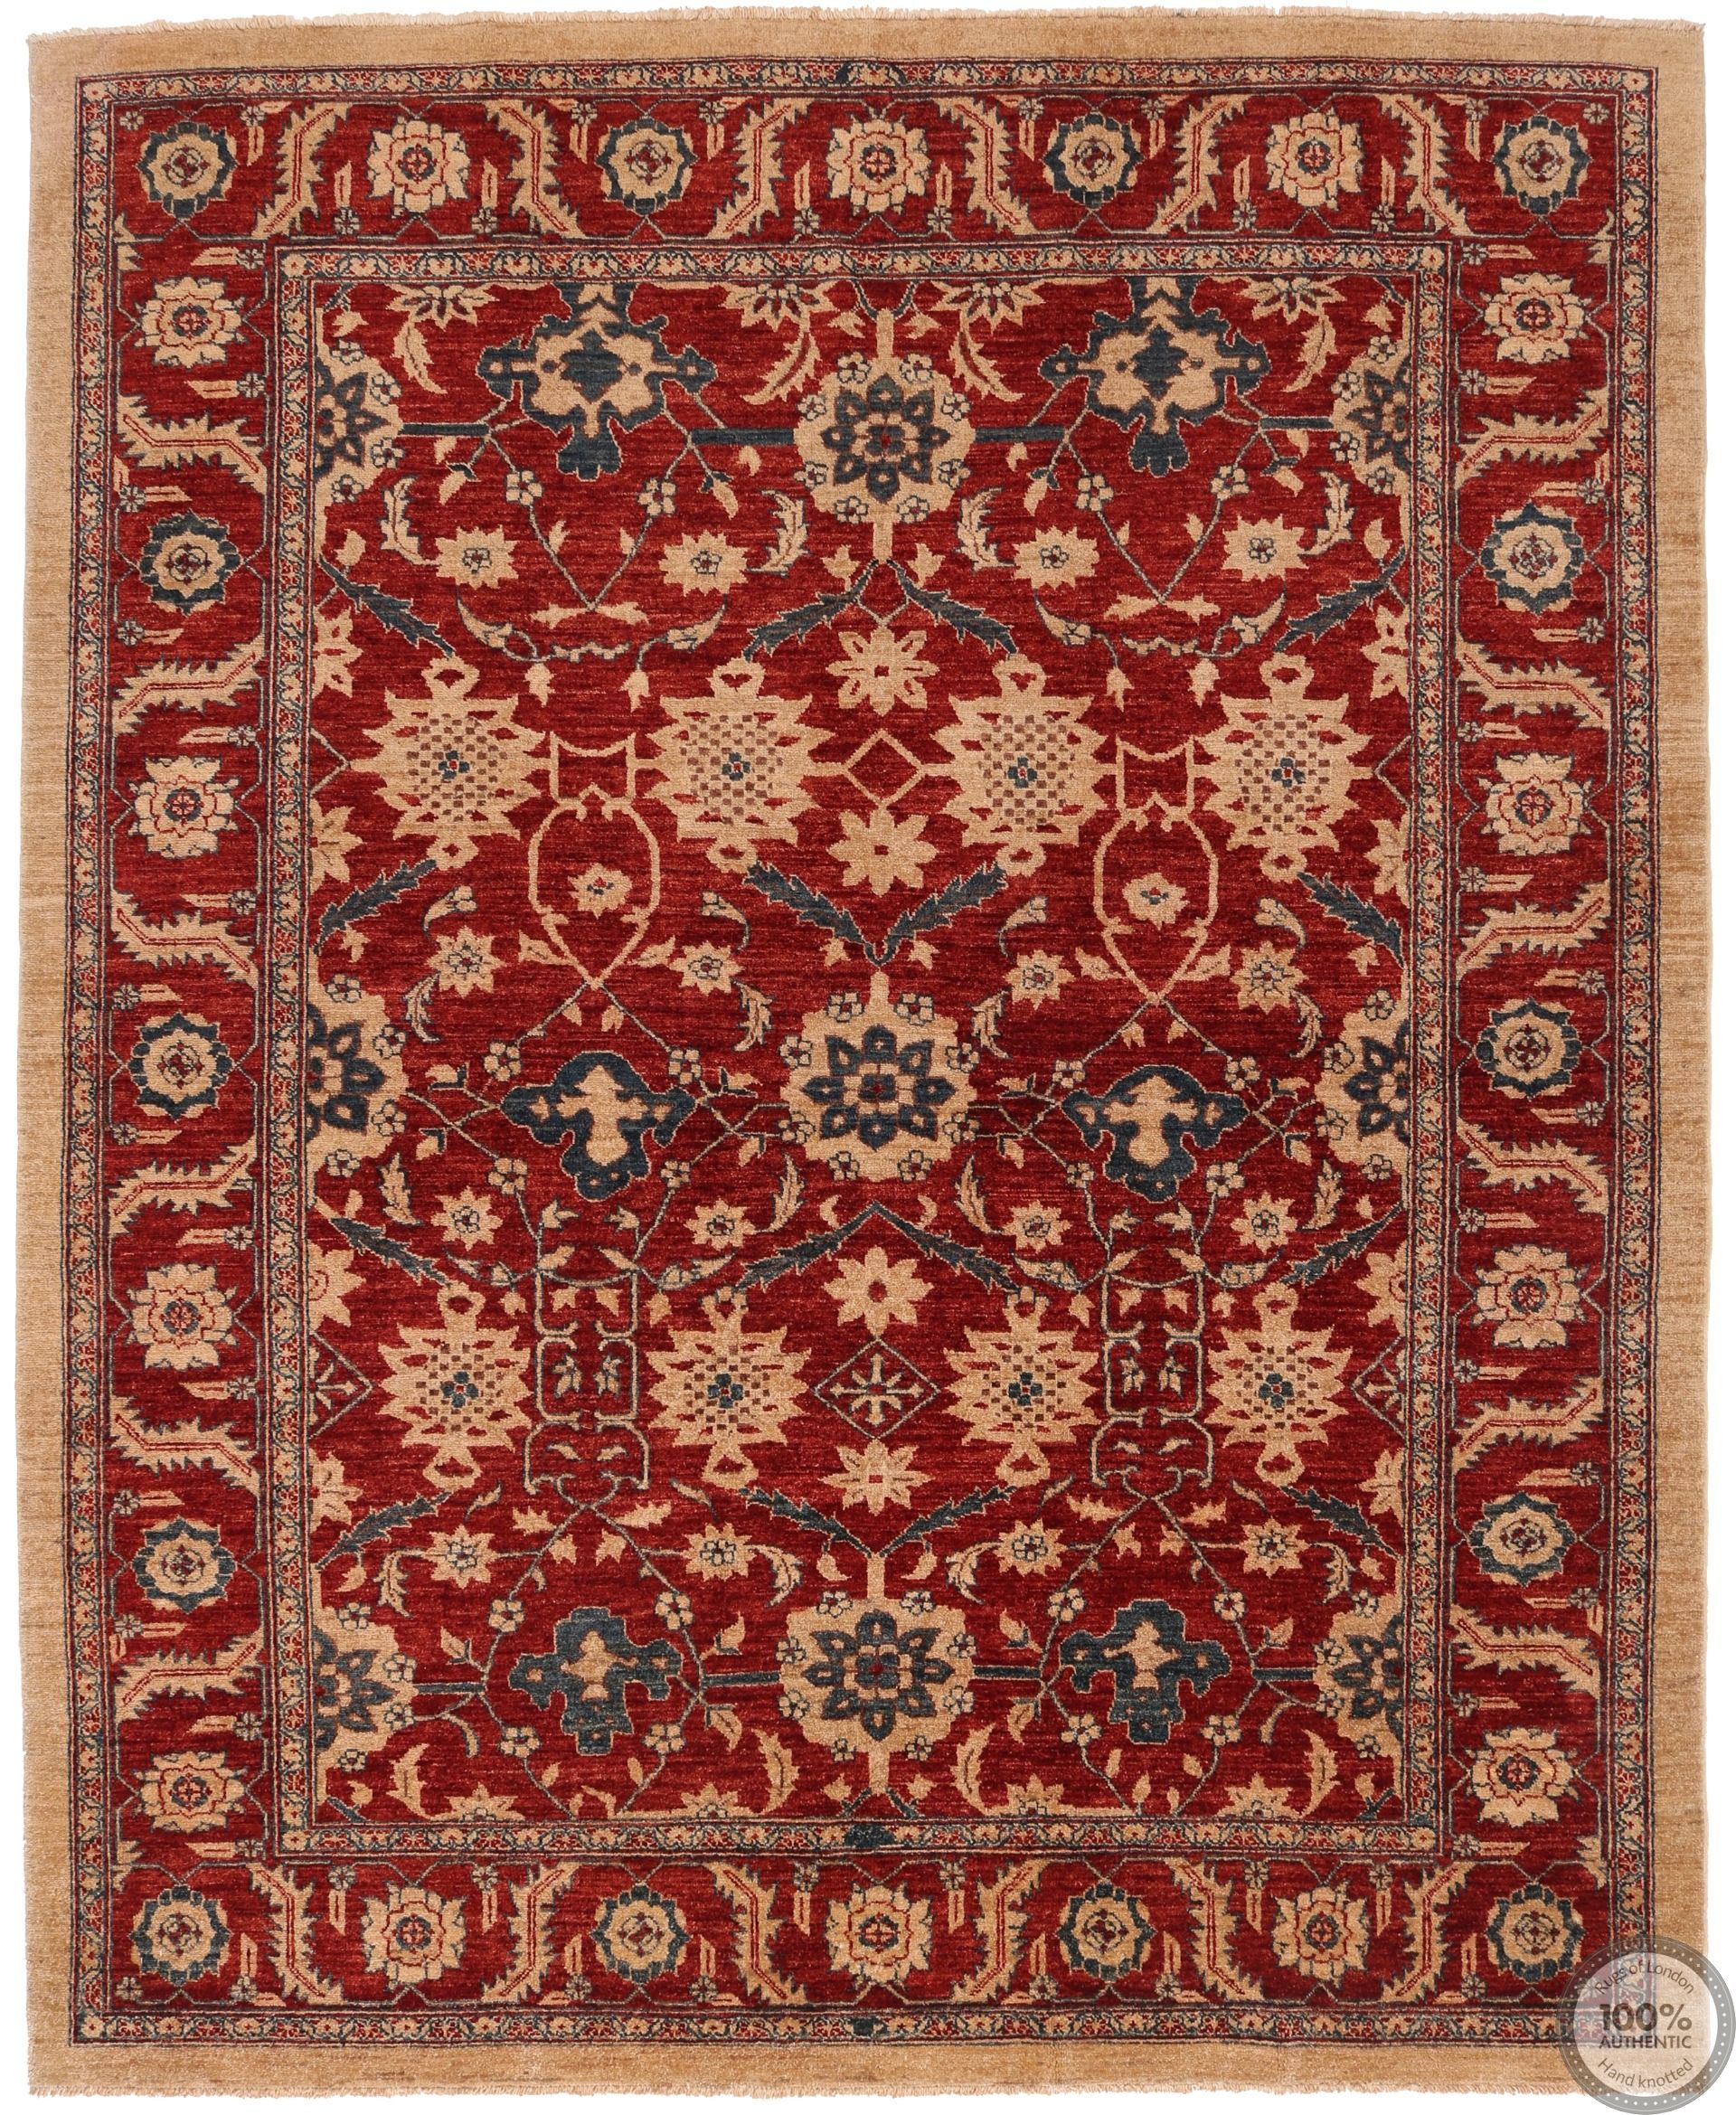 Garous Ziegler design rug 8'27 x 6'79